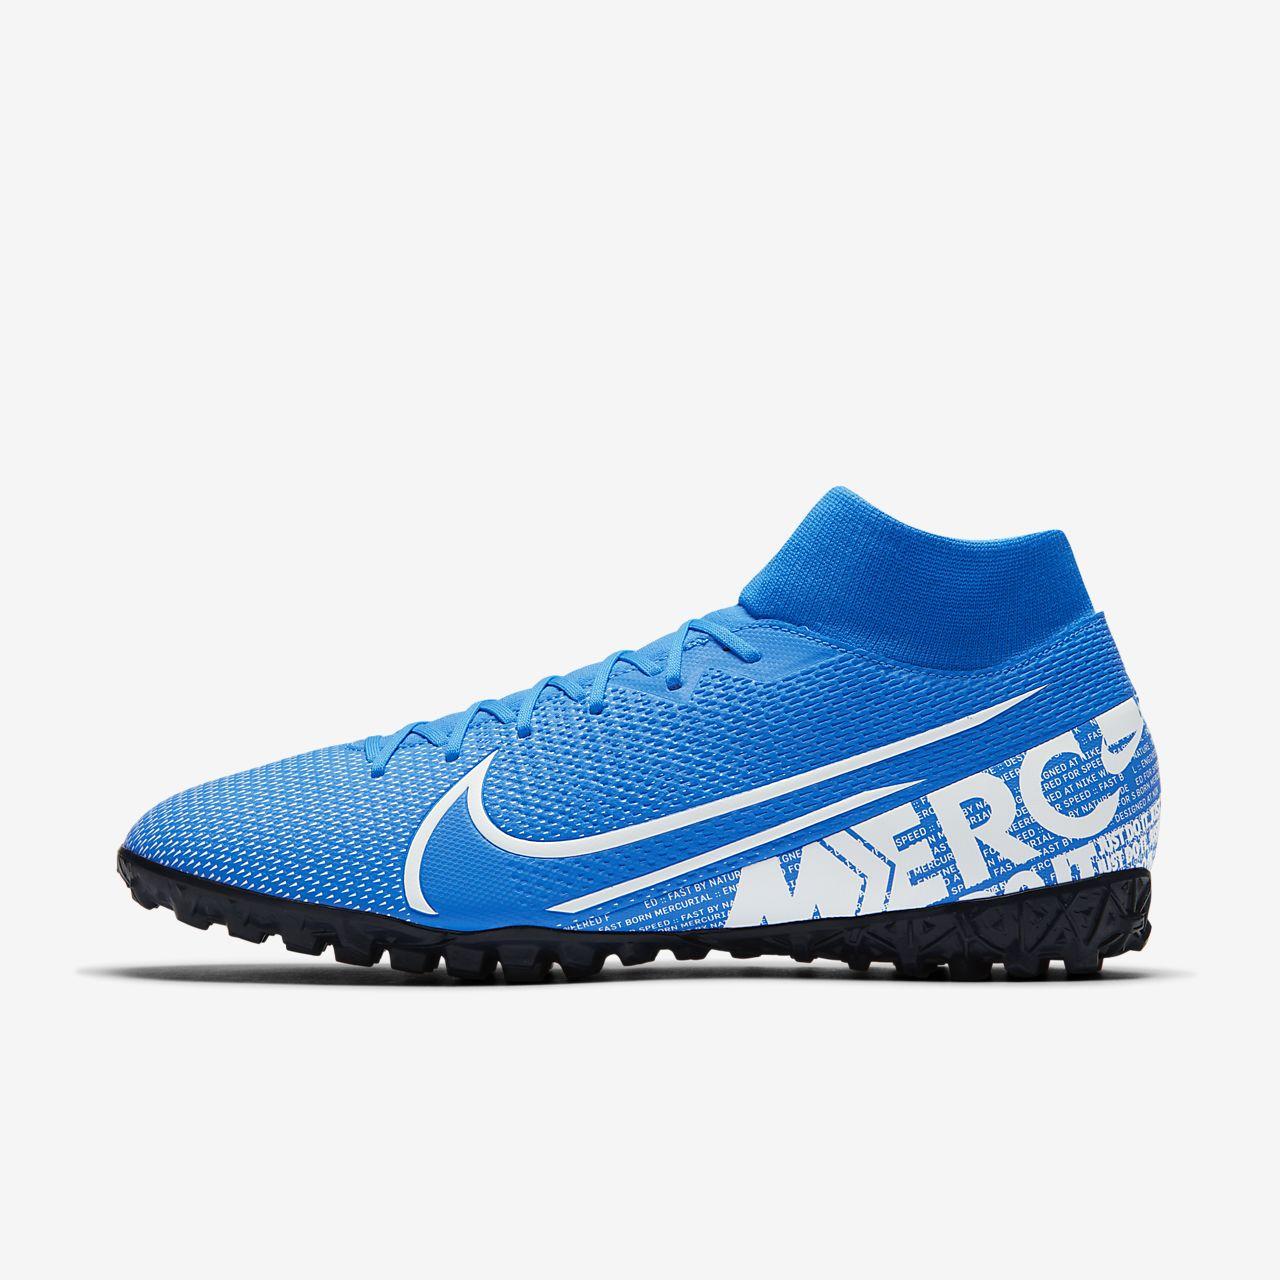 Fotbollssko för grus/turf Nike Mercurial Superfly 7 Academy TF